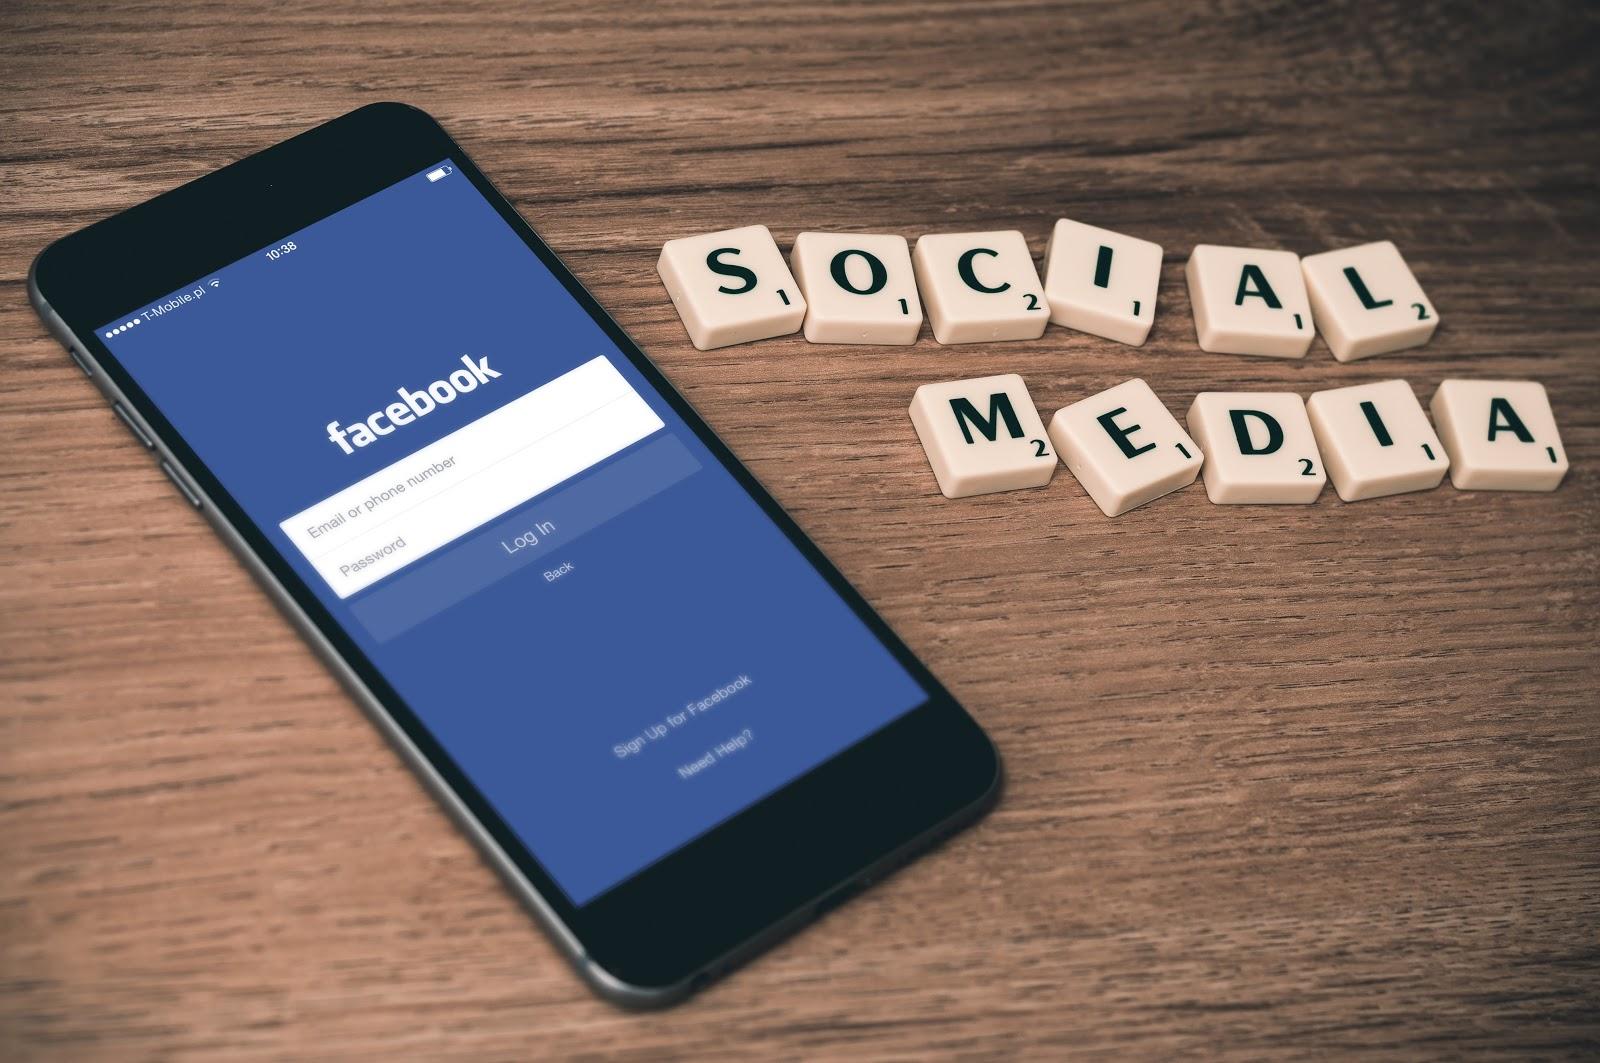 social media platforms help in connecting people